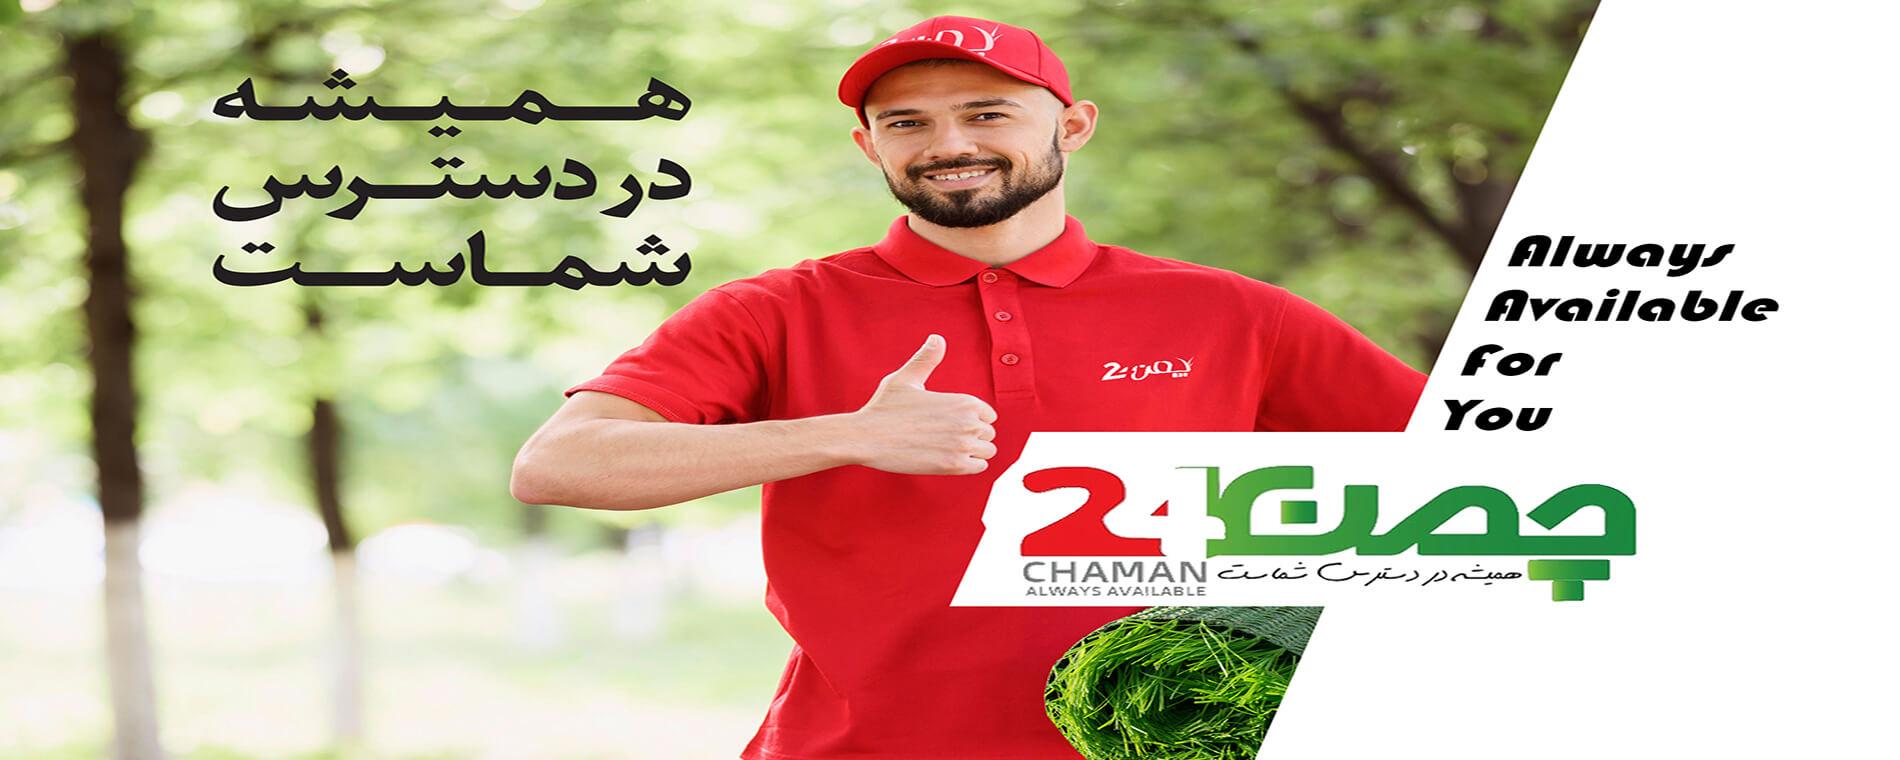 chaman24 slider 1